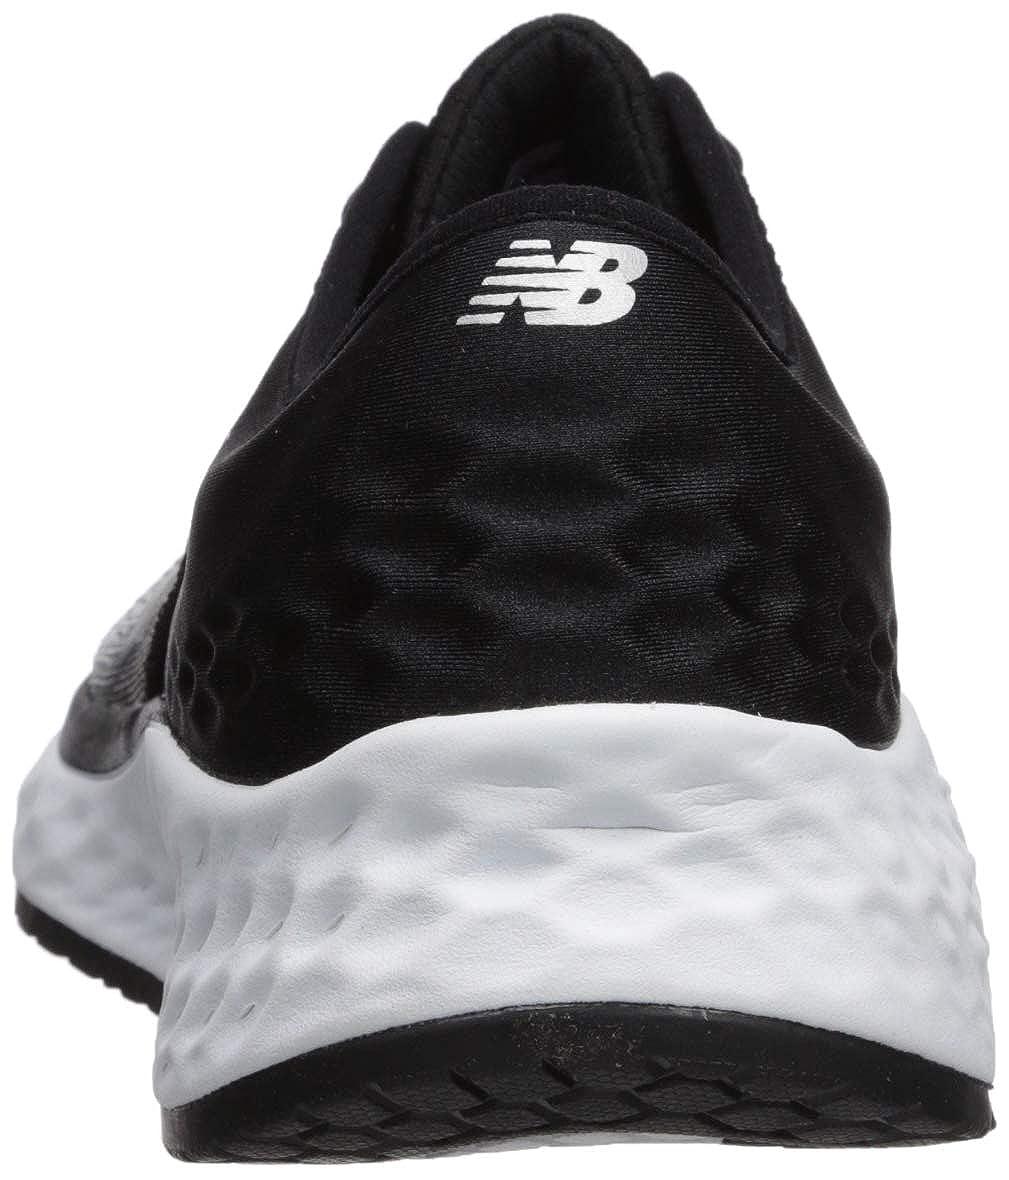 New Balance Damen Fresh Foam 1080v9 1080v9 1080v9 Laufschuhe Weiß (Weiß schwarz Voltage lila Wb9) 37.5 EU 106ce9